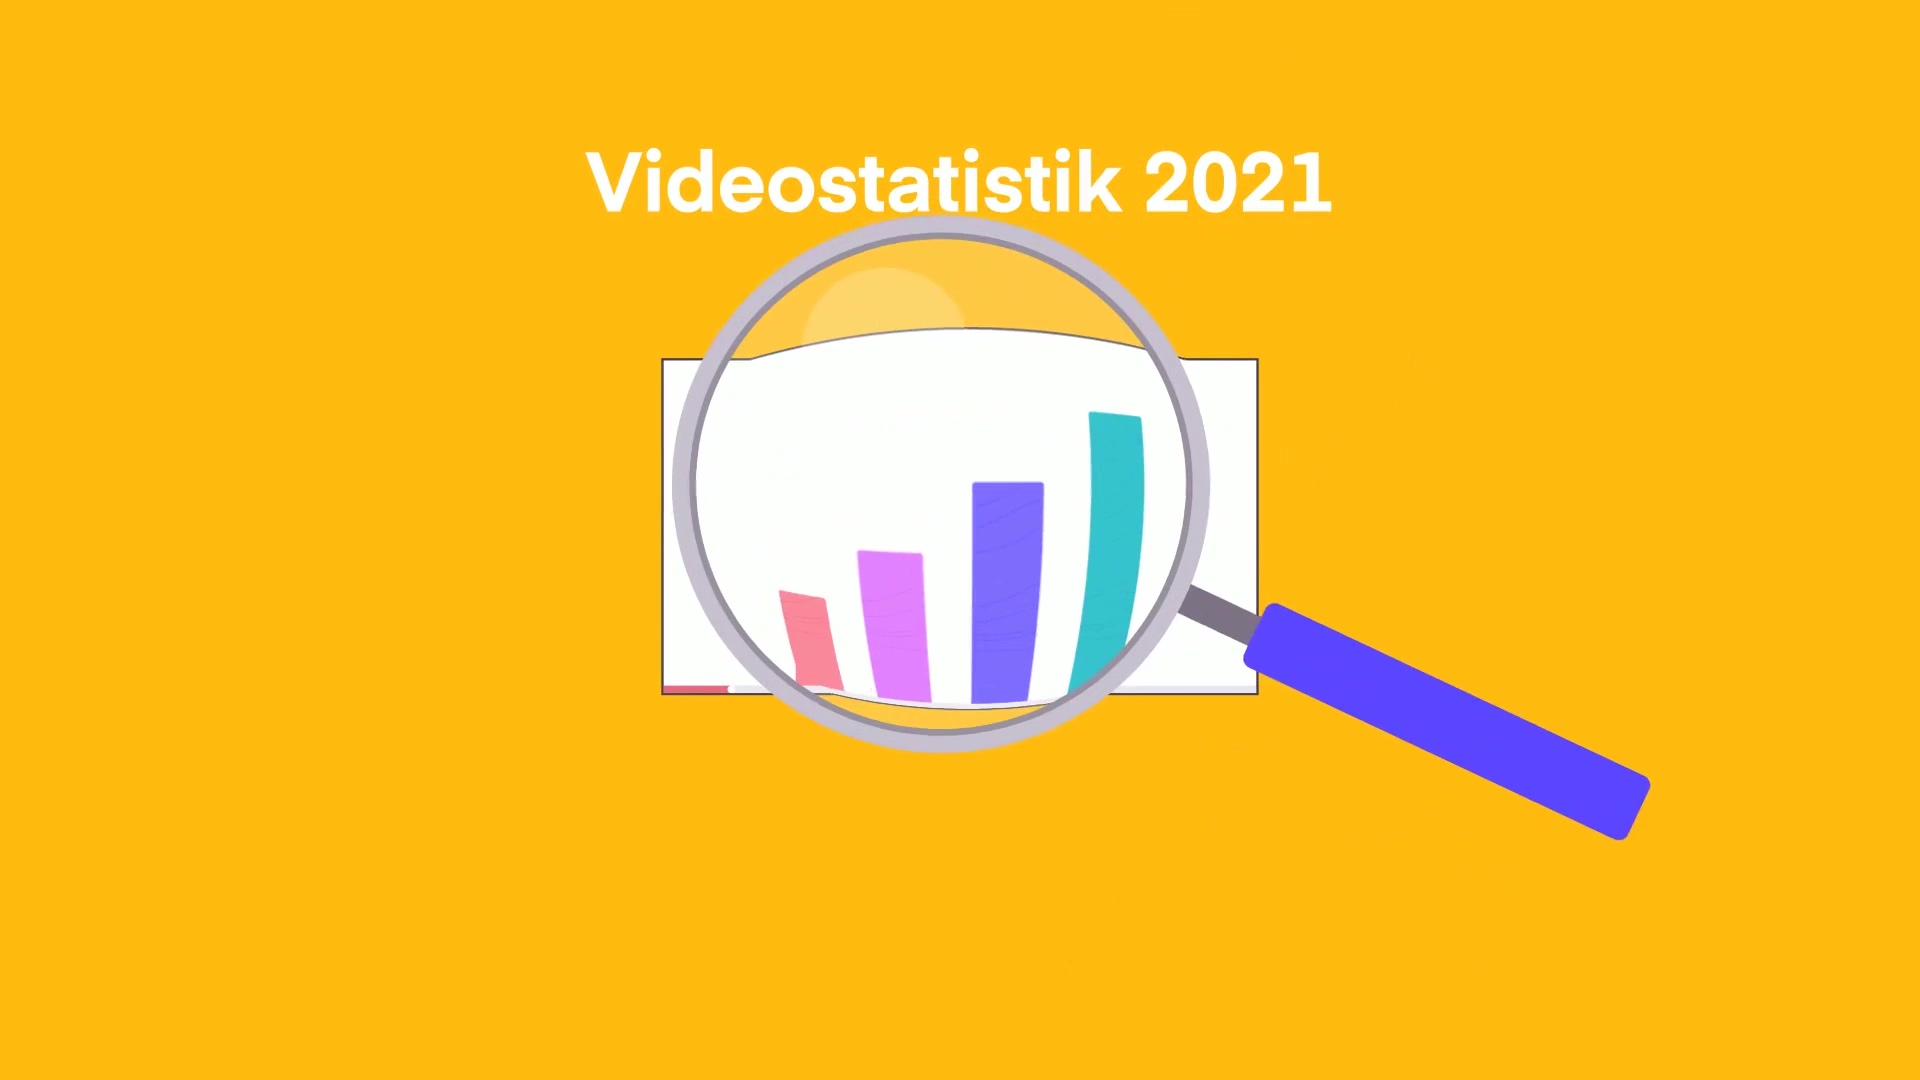 2103_STATISTISK_2021